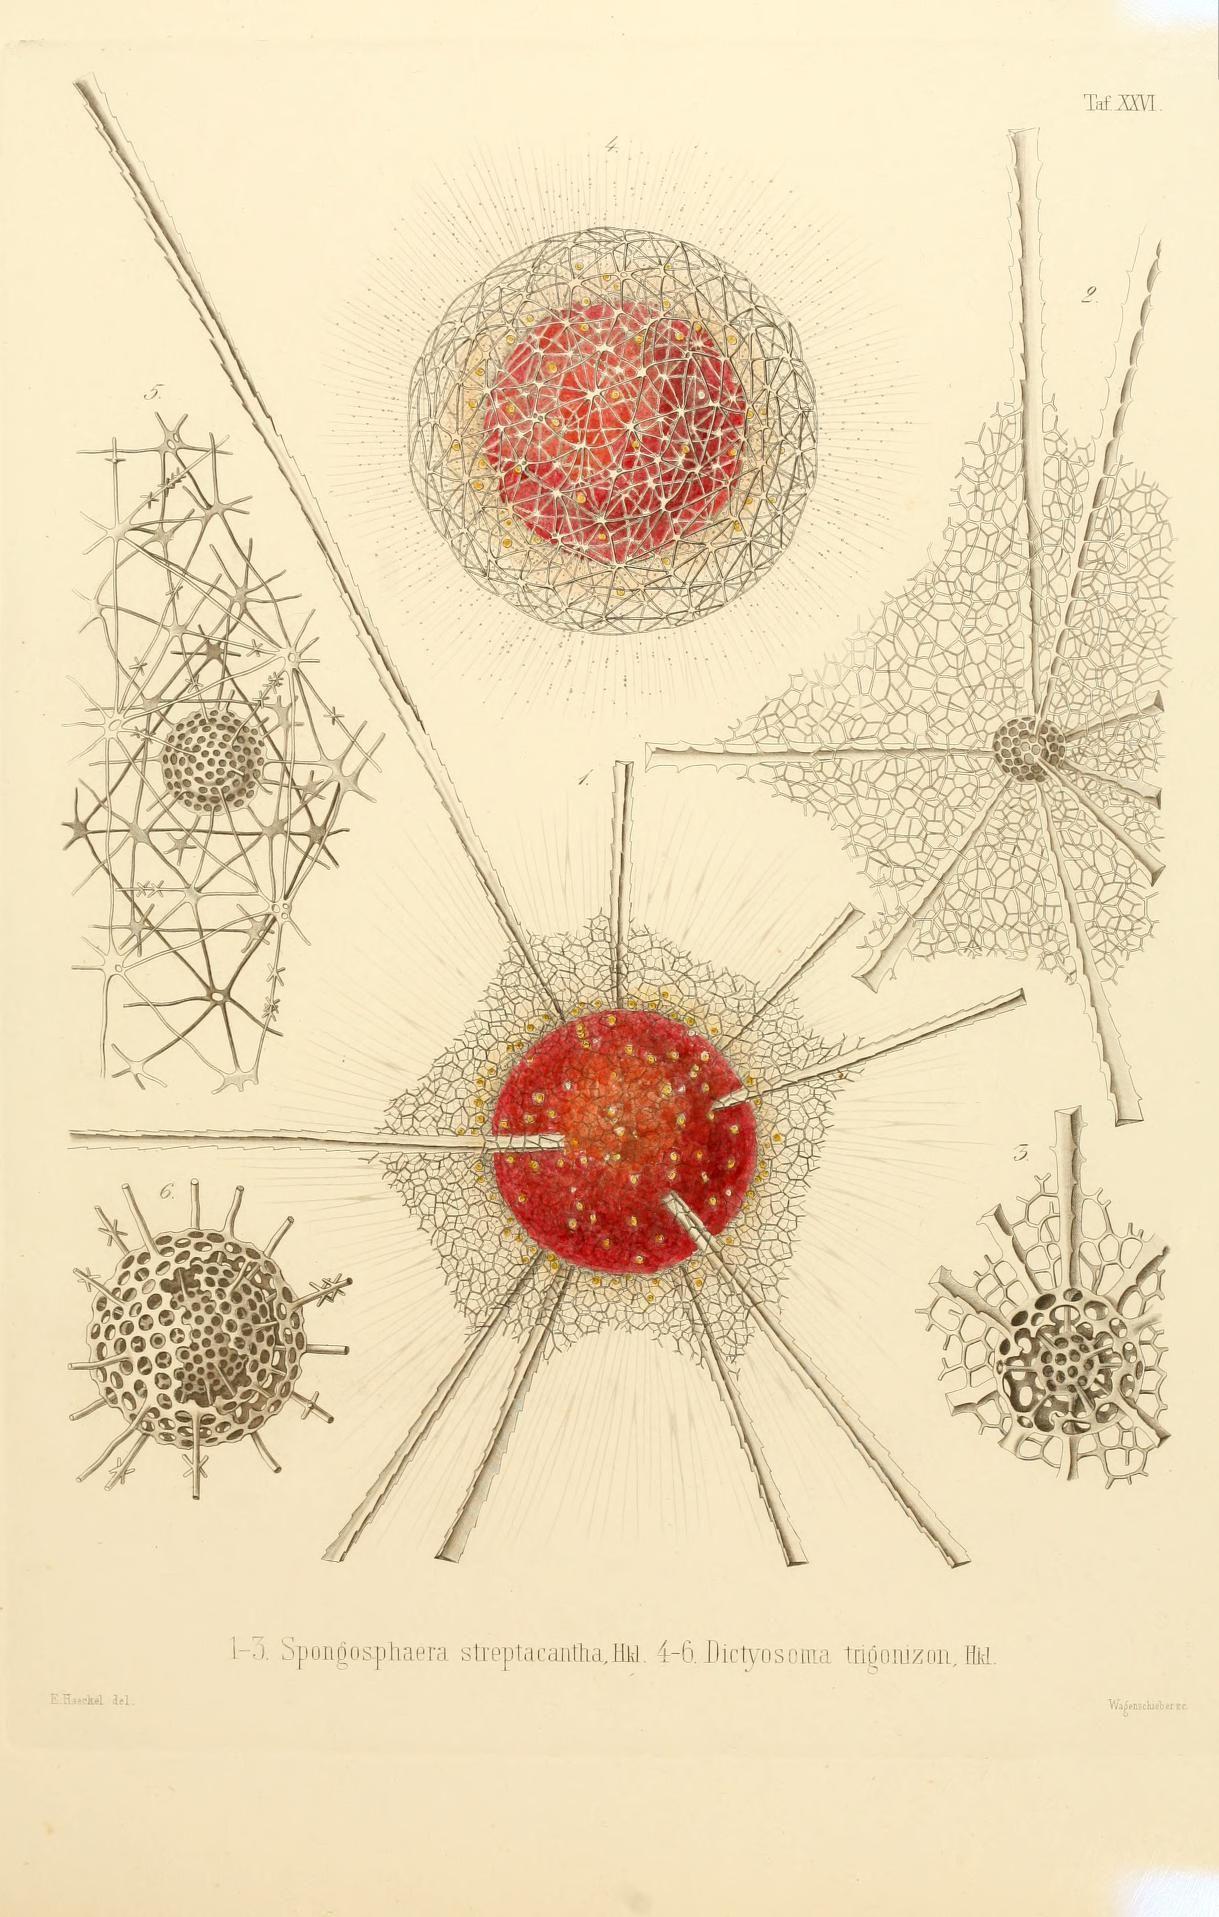 Art-Haeckel-Microscopic-Radiolarian-Haeckel-12.jpg 610×959 pixels